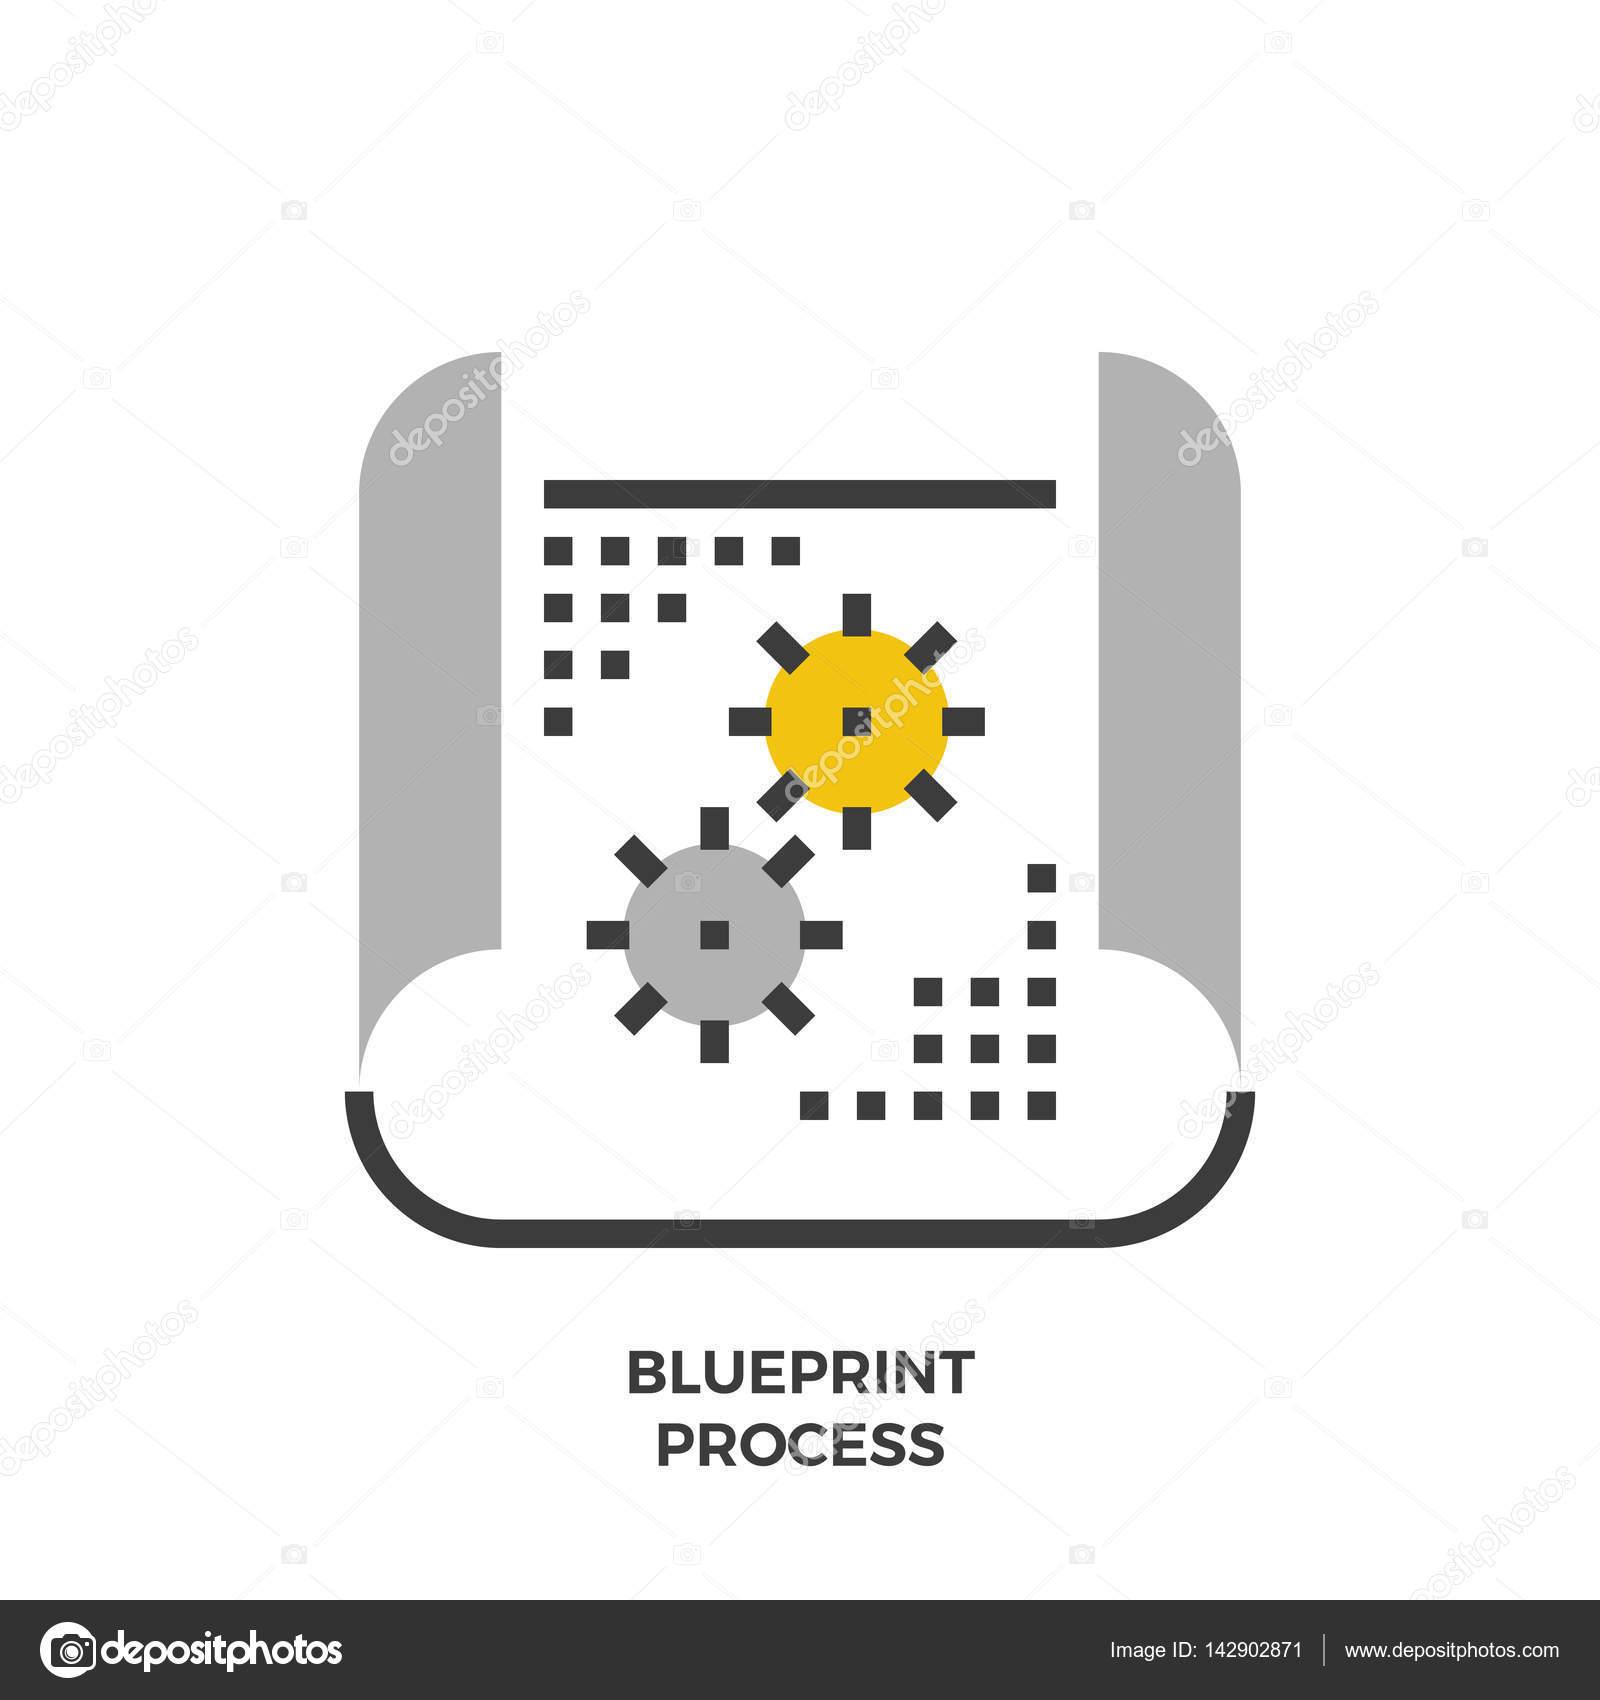 Blueprint process flat icon stock vector paradisestocks 142902871 blueprint process flat icon stock vector malvernweather Gallery